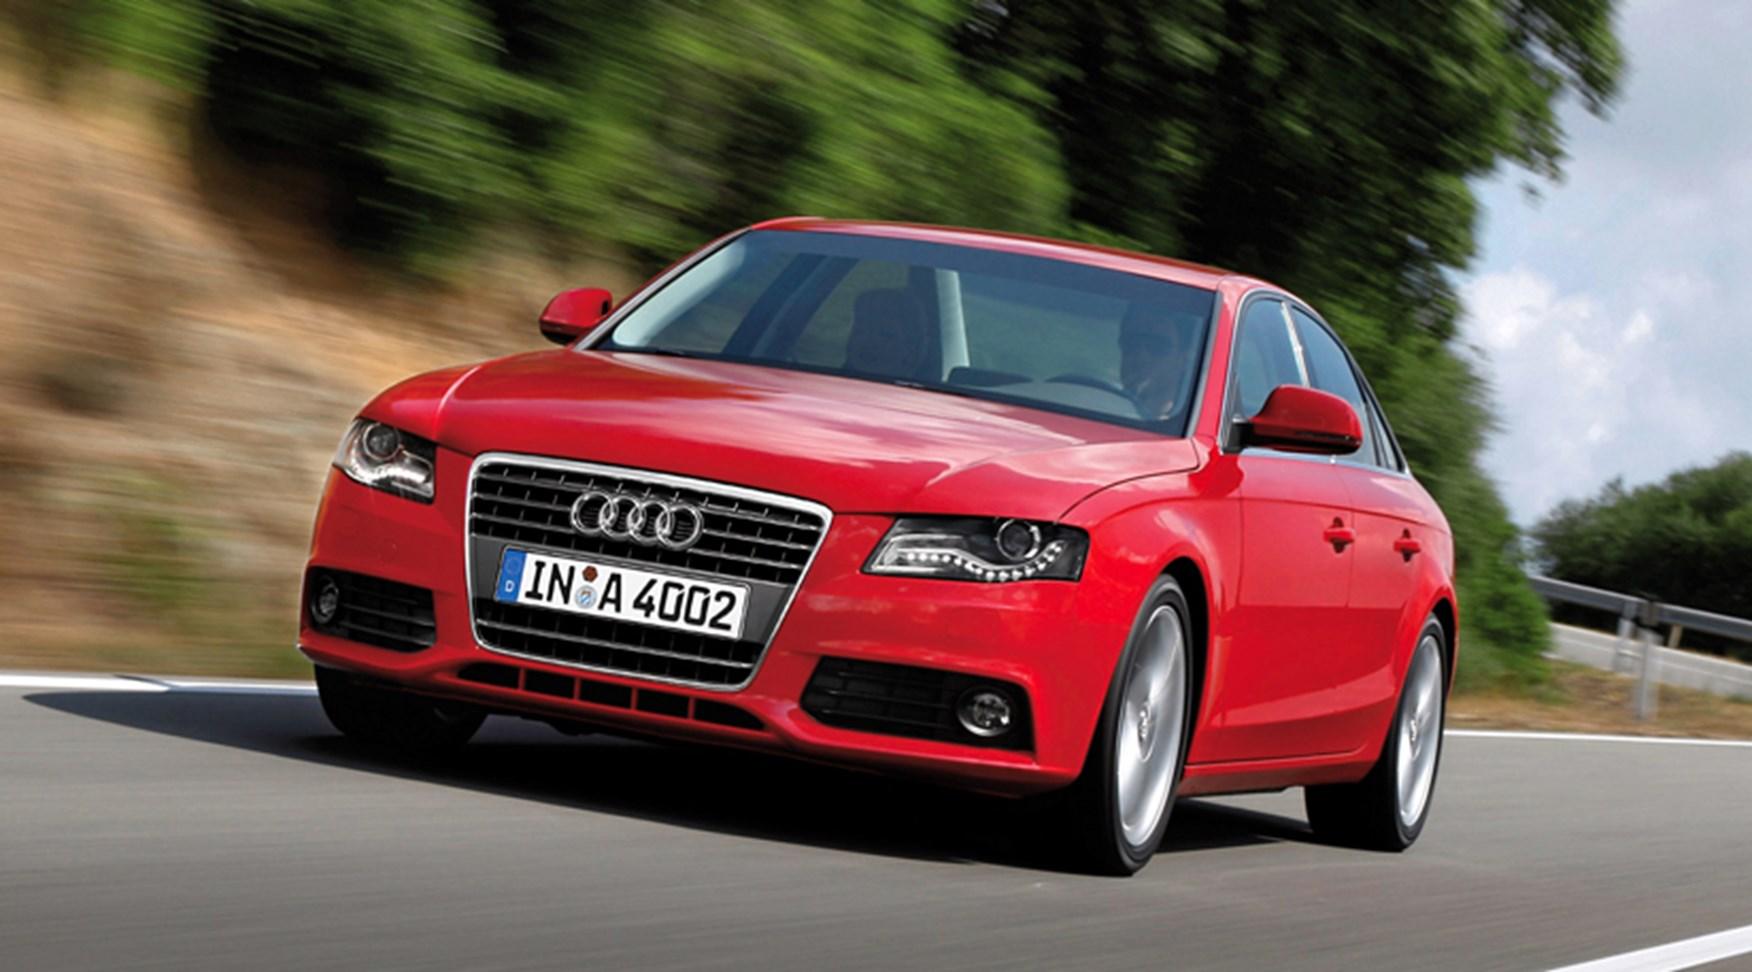 0 Down Lease Deals >> Audi A4 2.0 TDI SE (2008) review by CAR Magazine